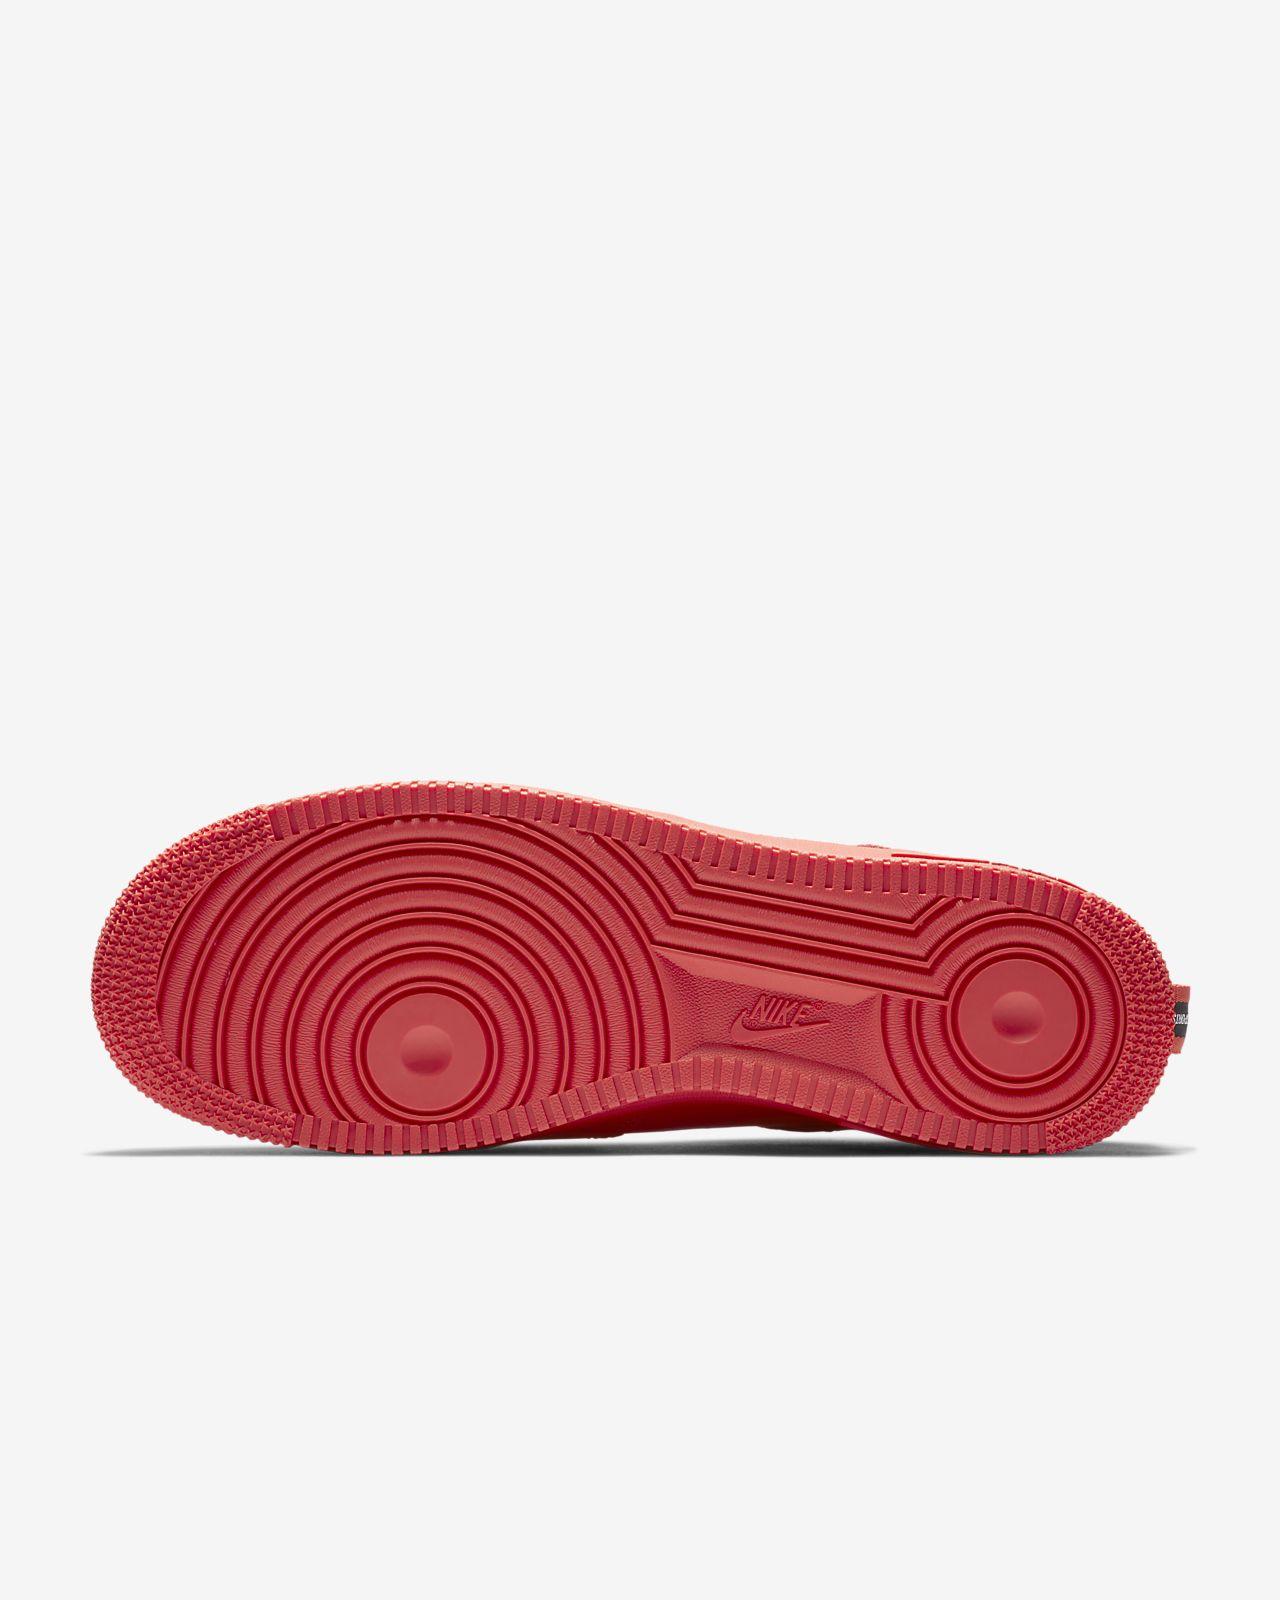 ffd21275acde Nike Air Force 1  07 LV8 Utility Men s Shoe. Nike.com ZA